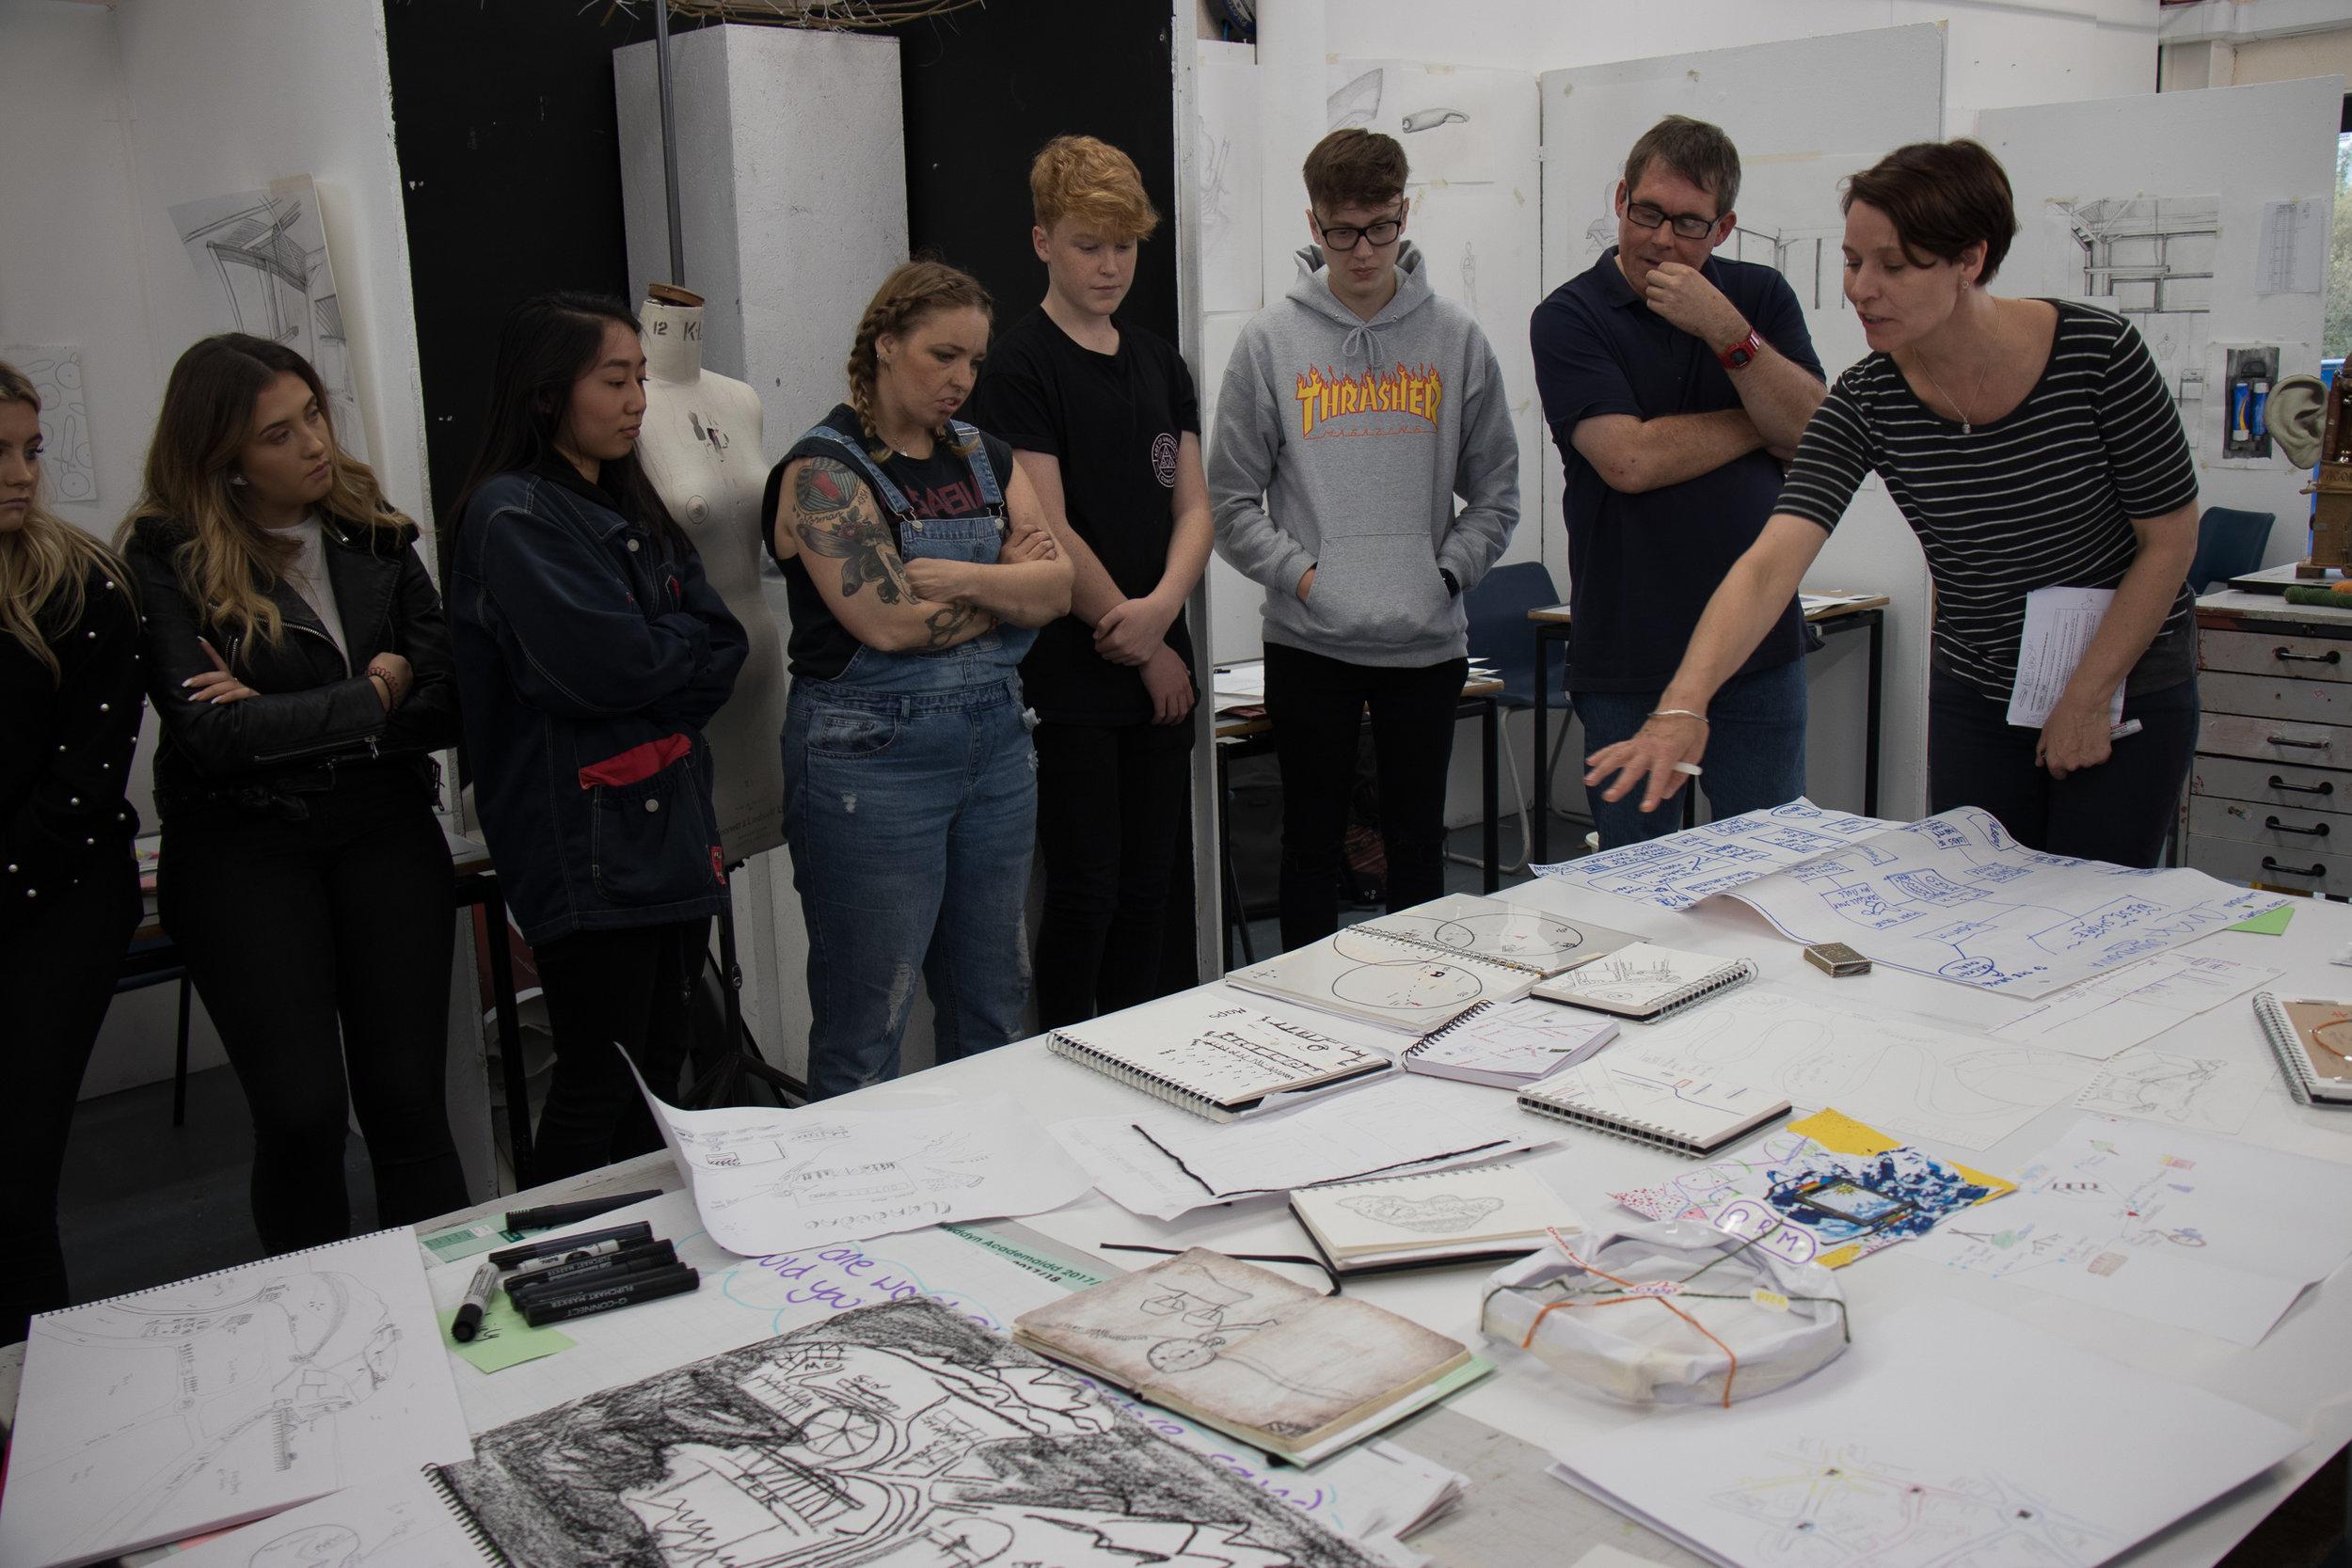 coleg llandrillo workshop (5 of 29).jpg